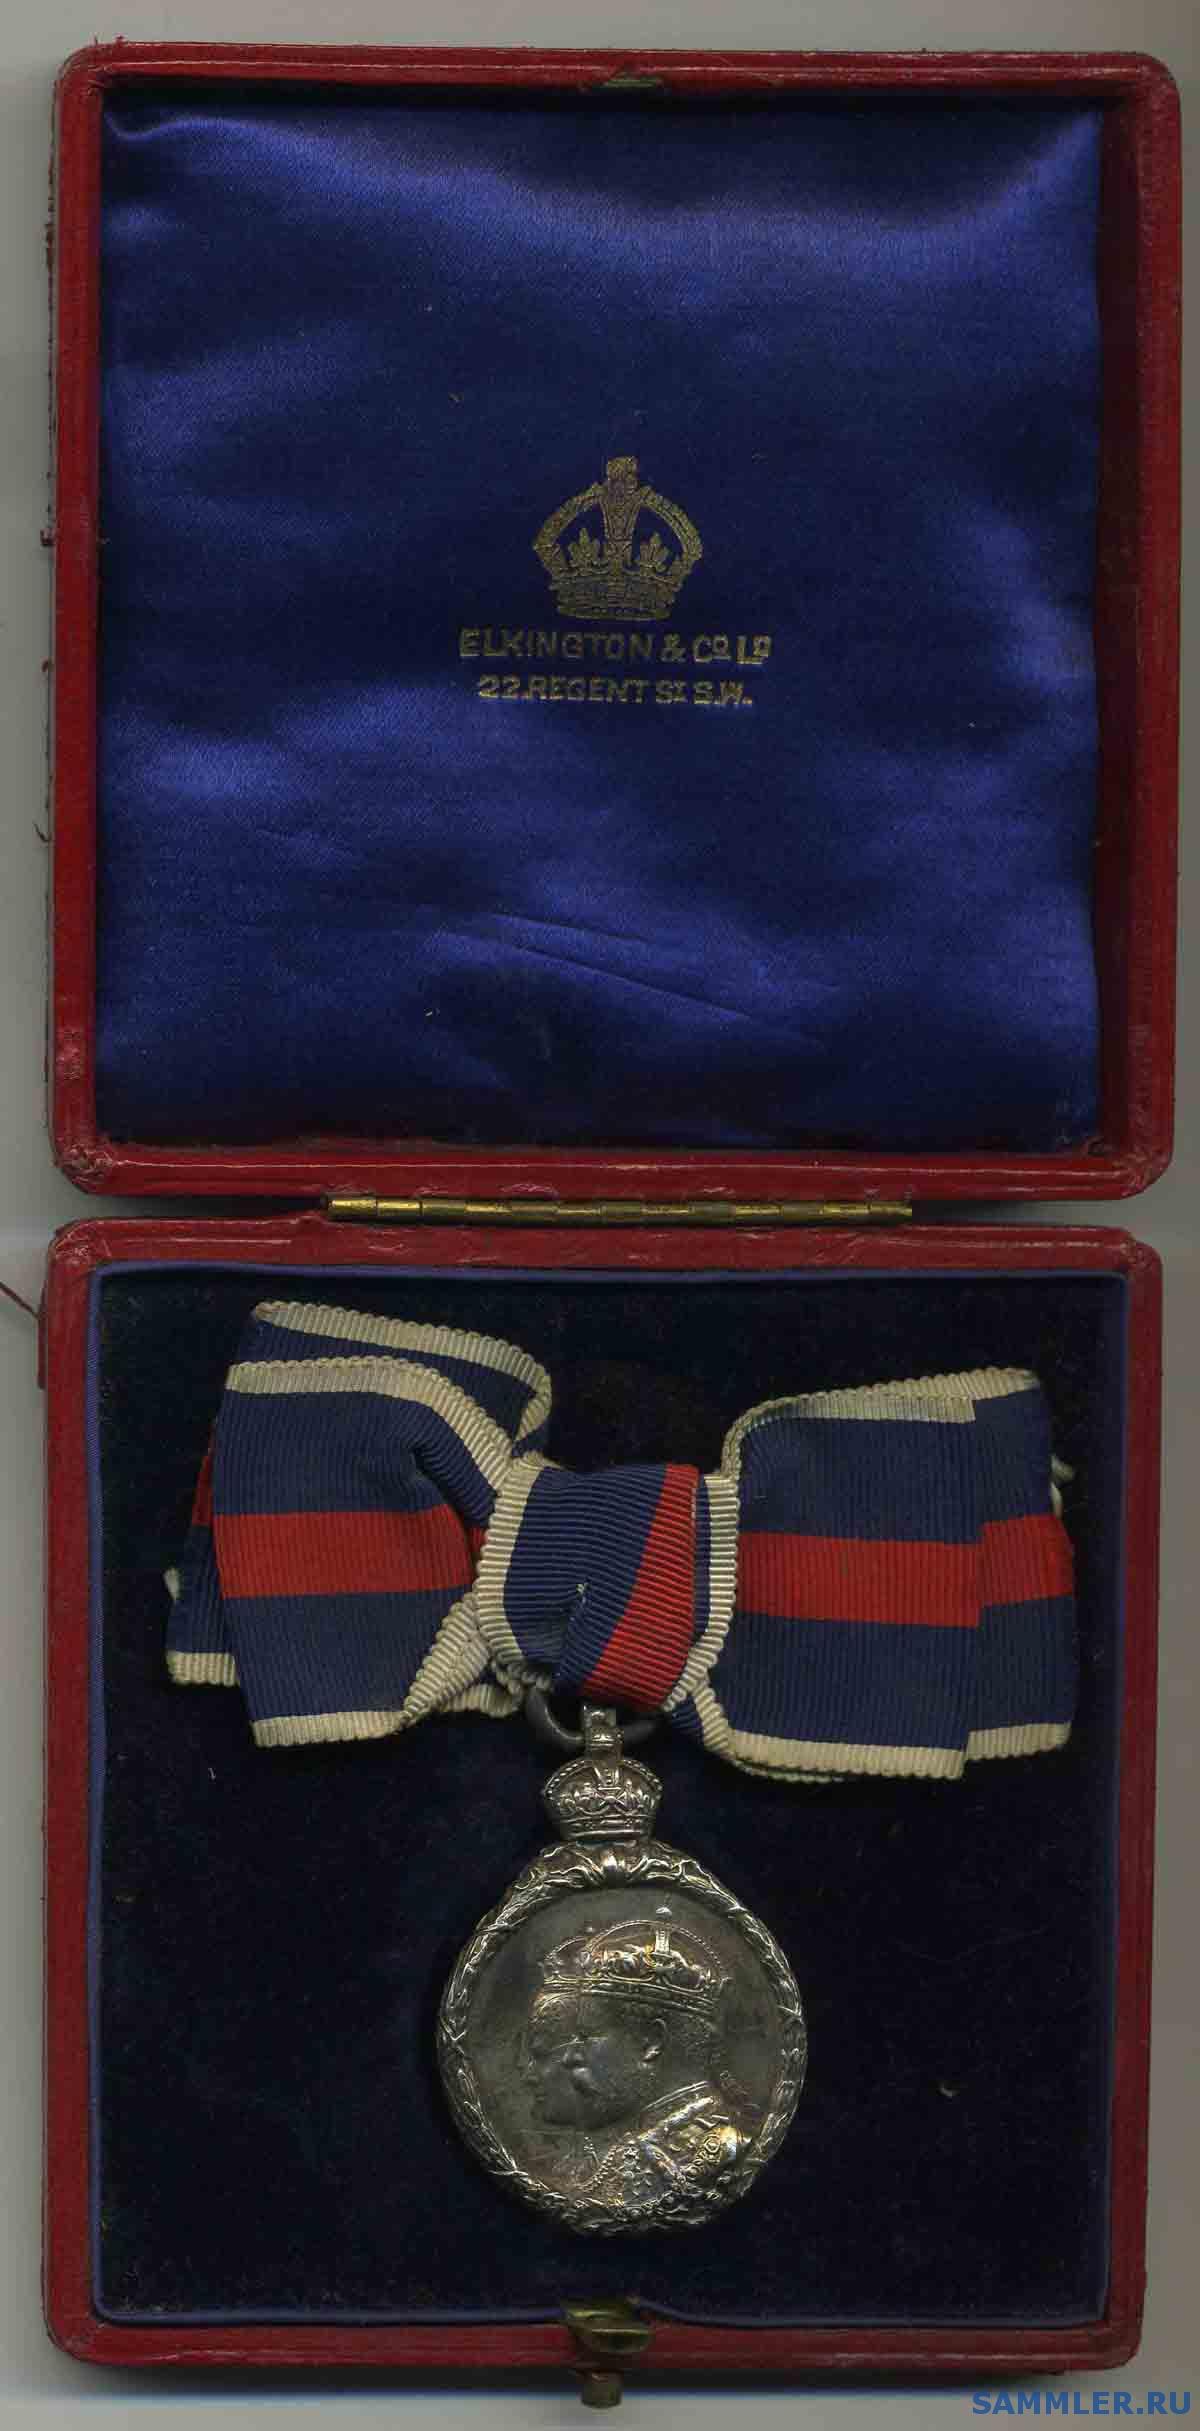 Coronation_Medal_1902_silver.jpg